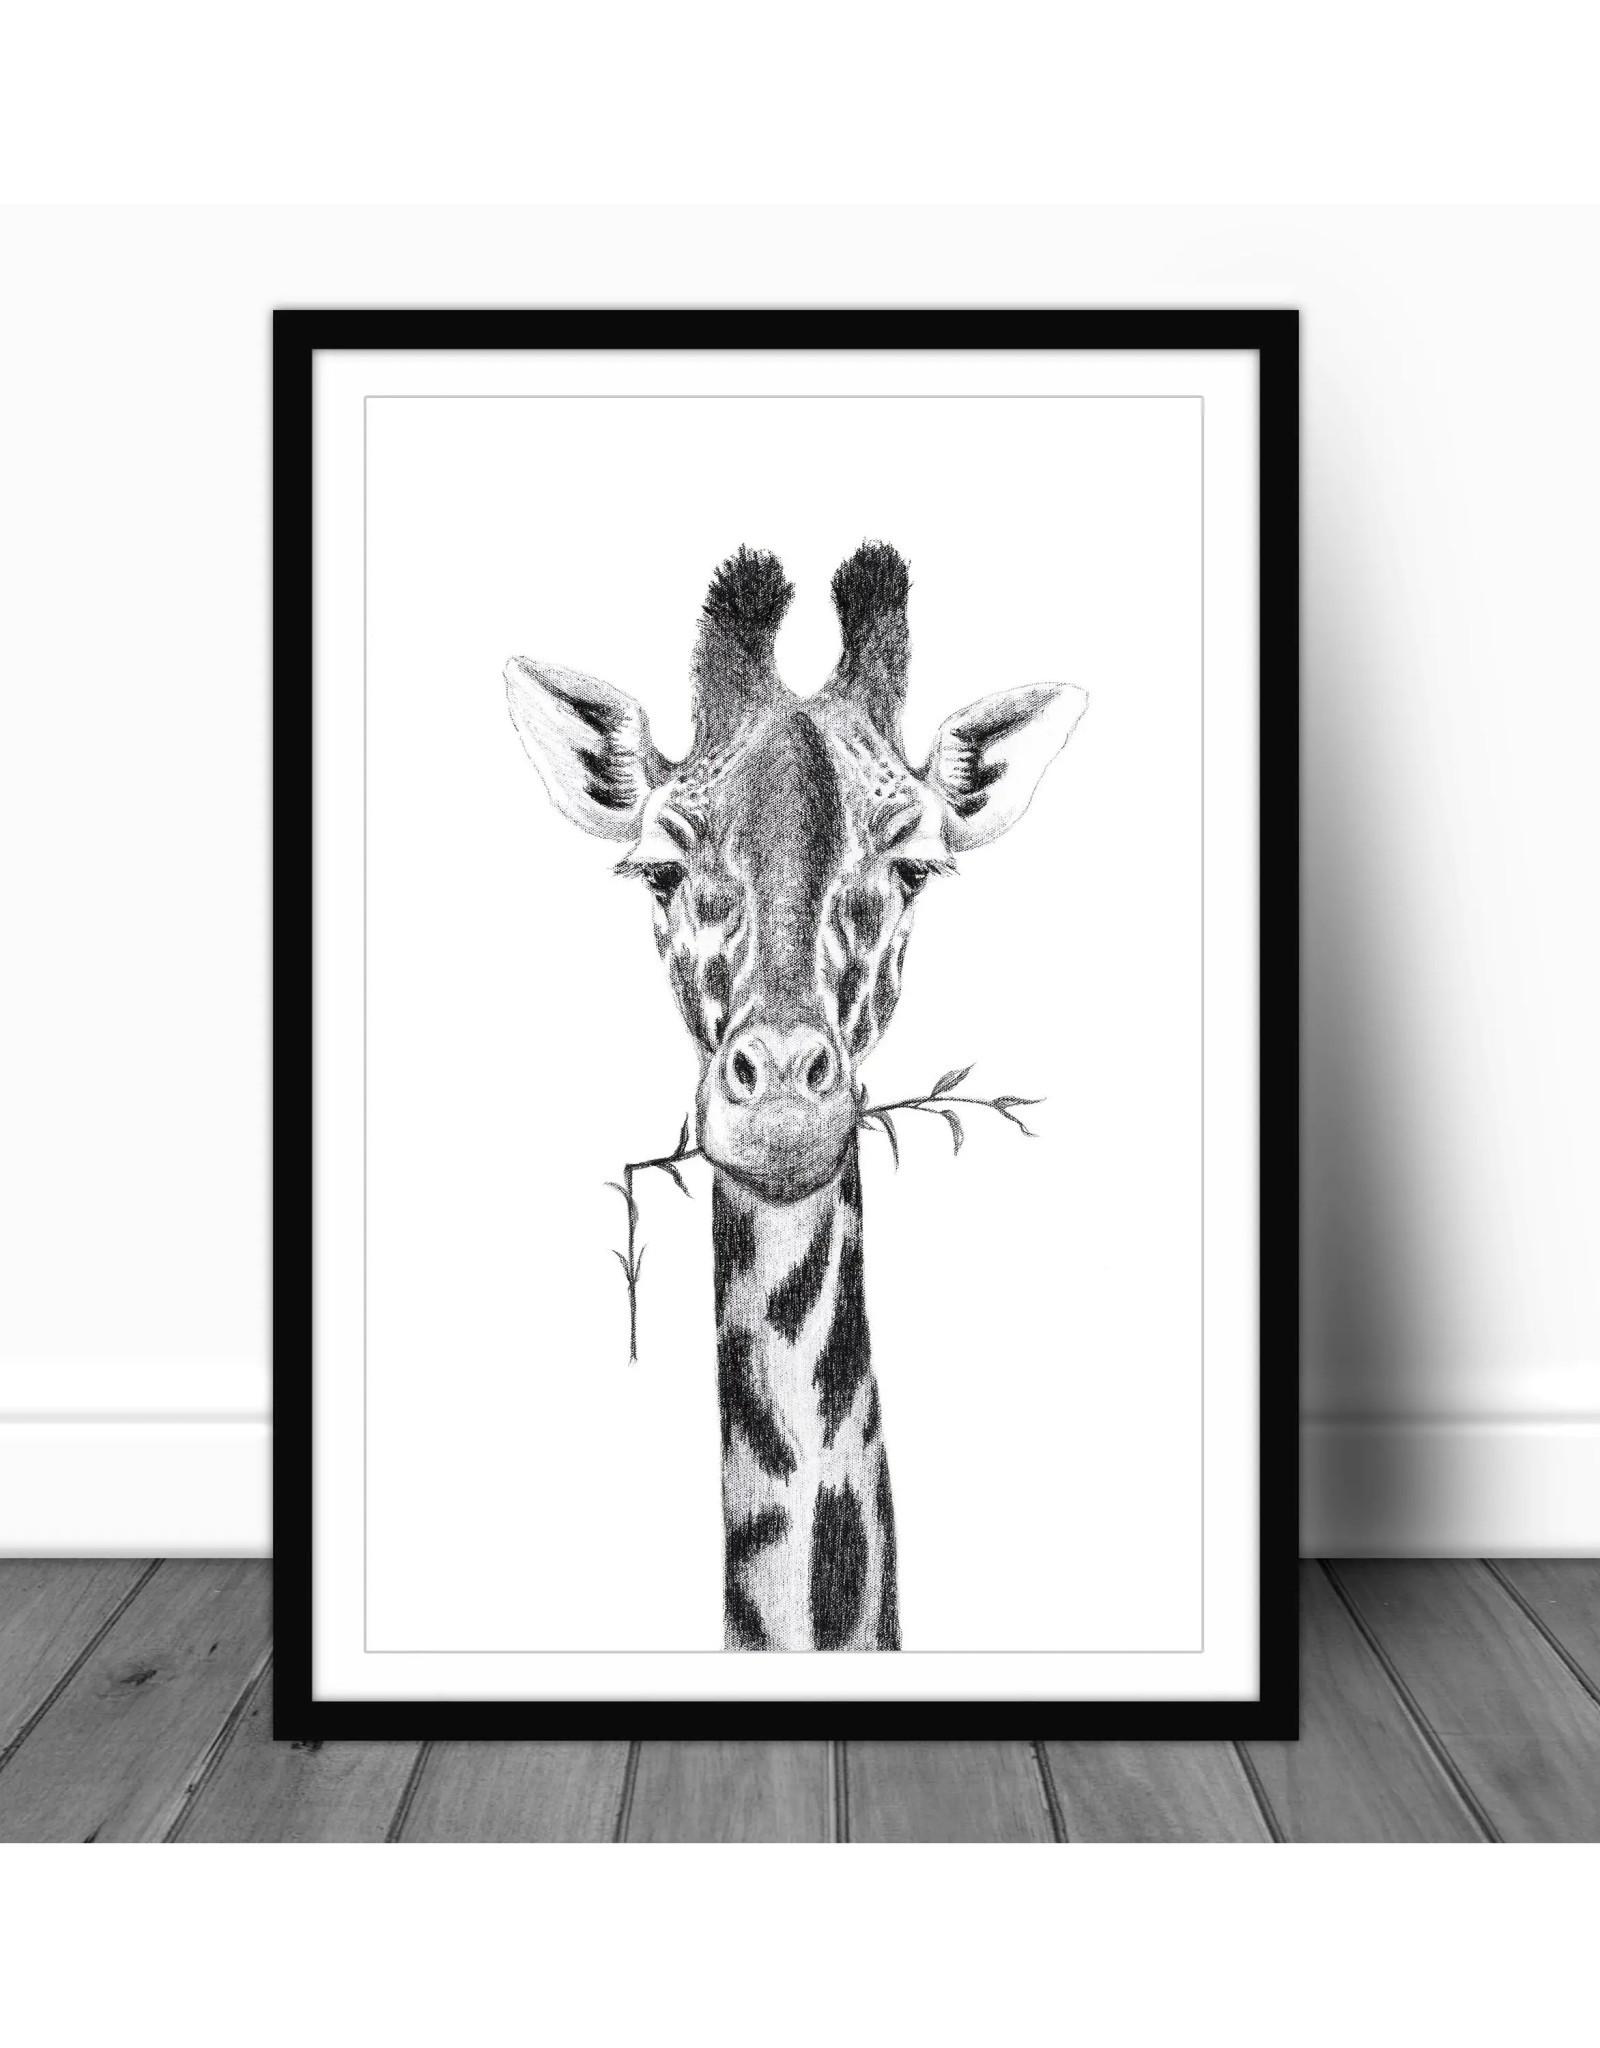 Le Nid - Girafe Portrait  Paper - 12x18